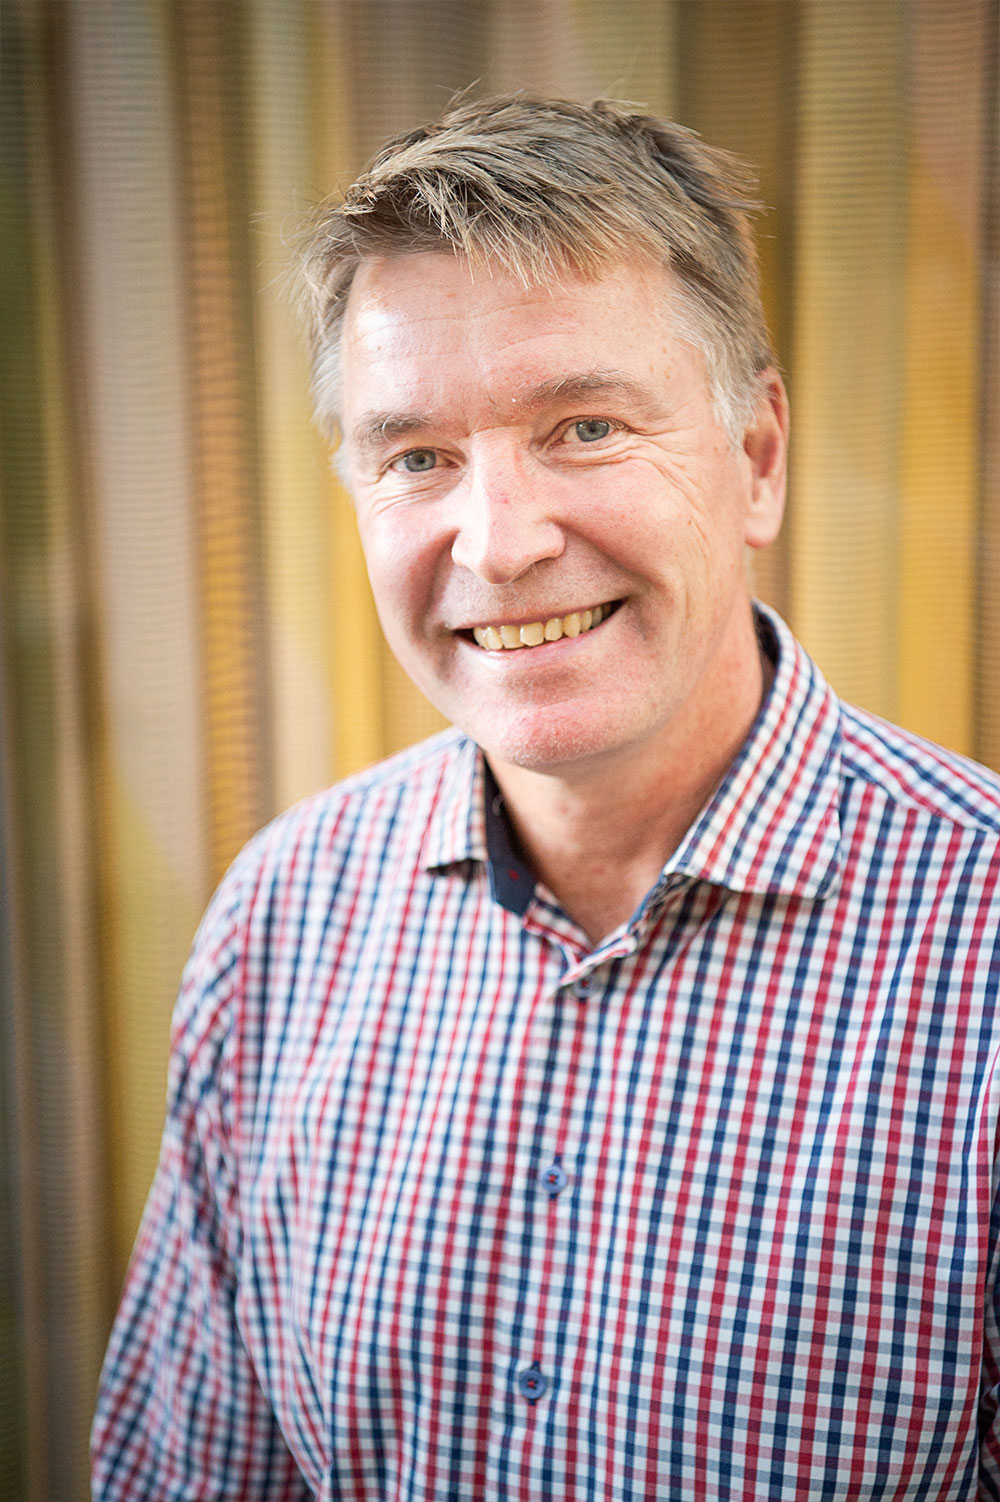 Håkan-Axelsson-Chalmers-Ventures